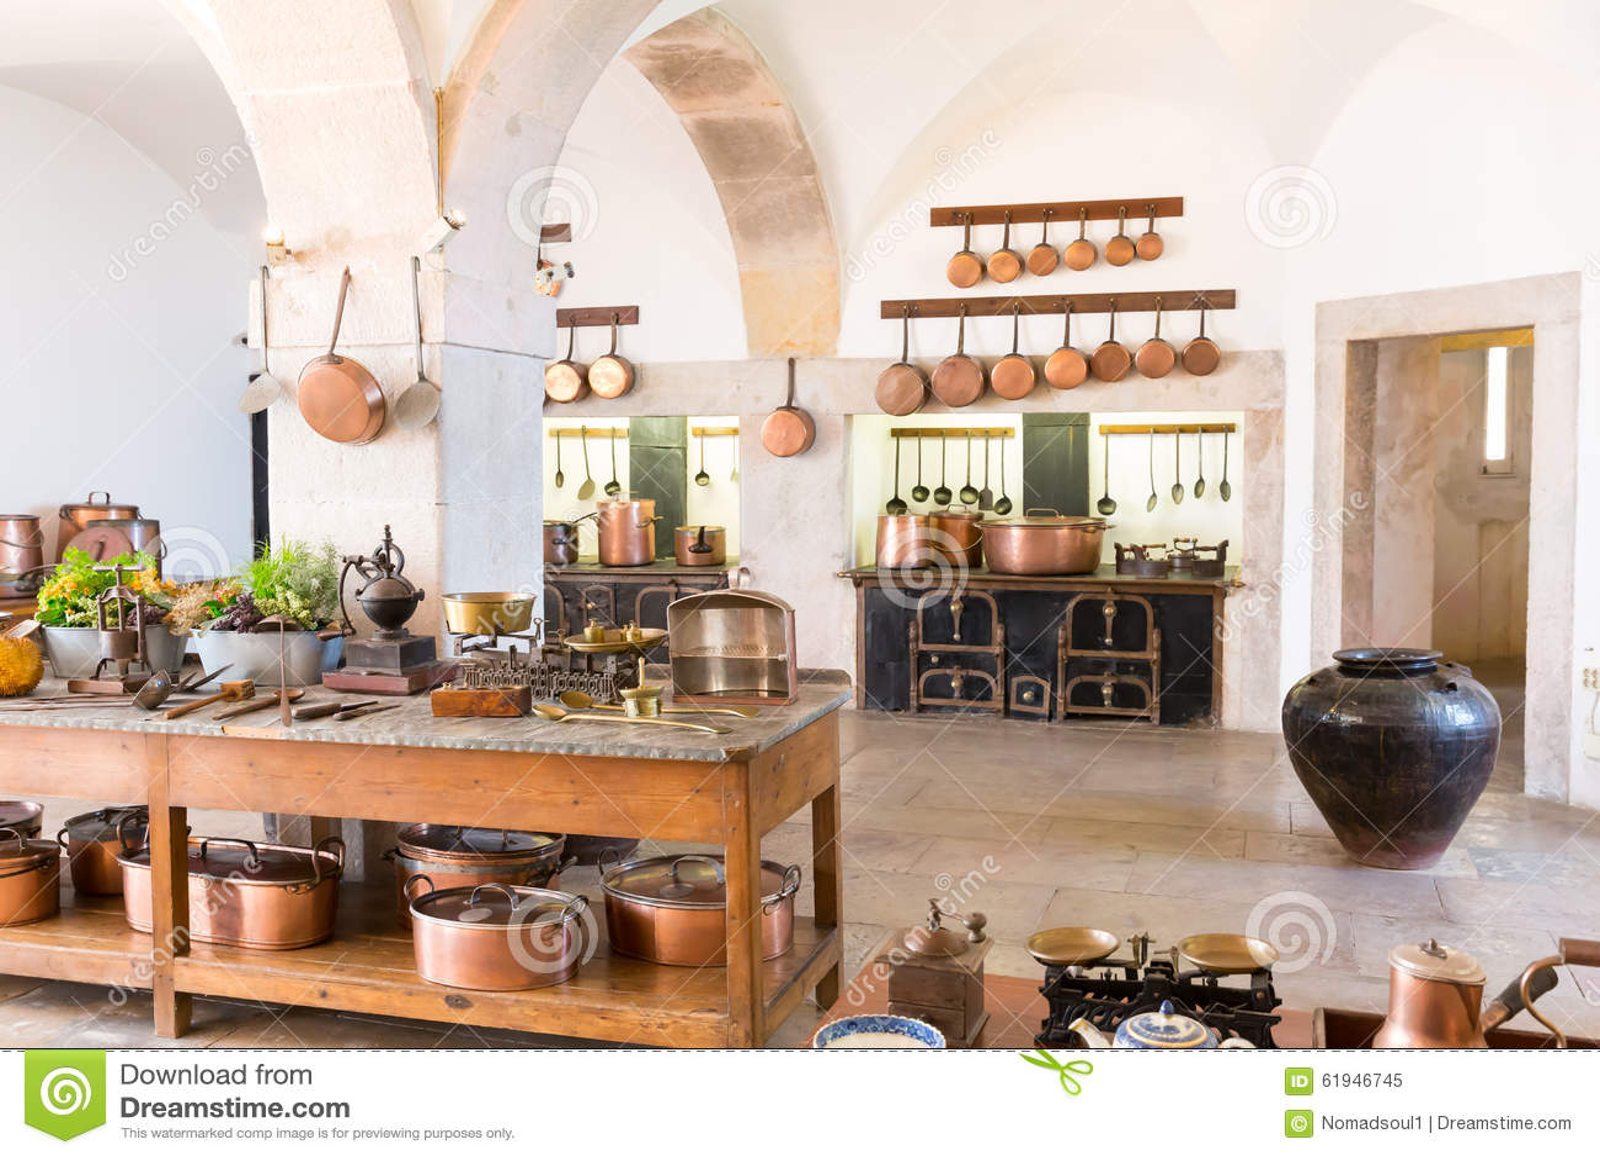 retro- küche stockfoto - bild: 61946745